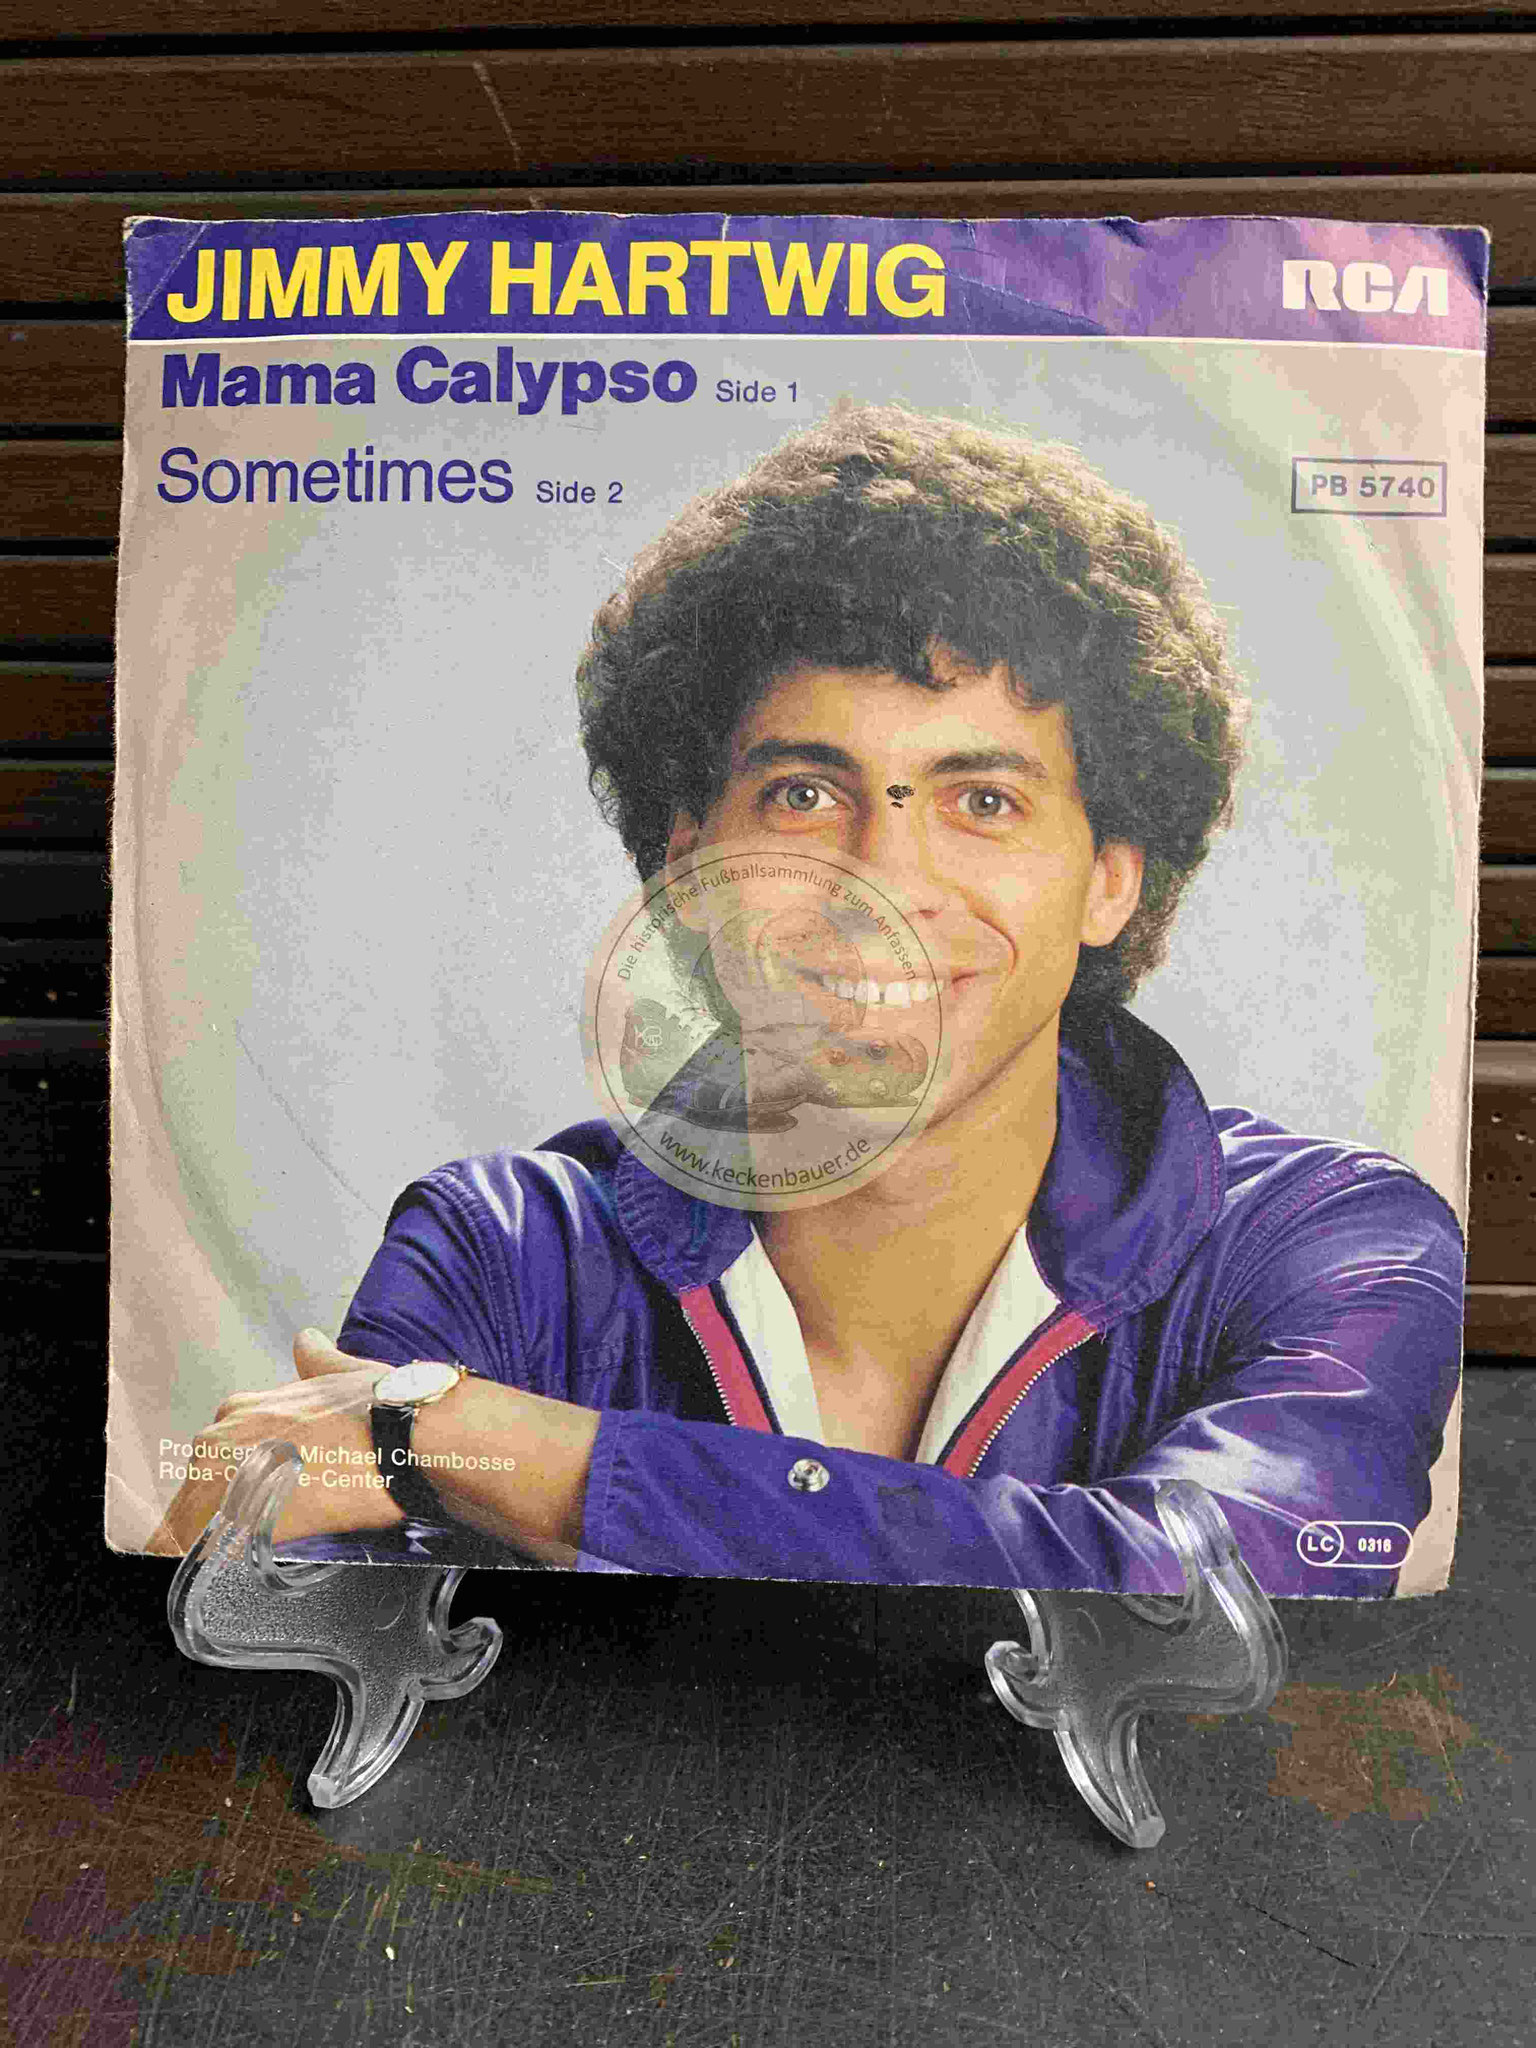 1980 Fußball-Single Mama Calypso von Jimmy Hartwig